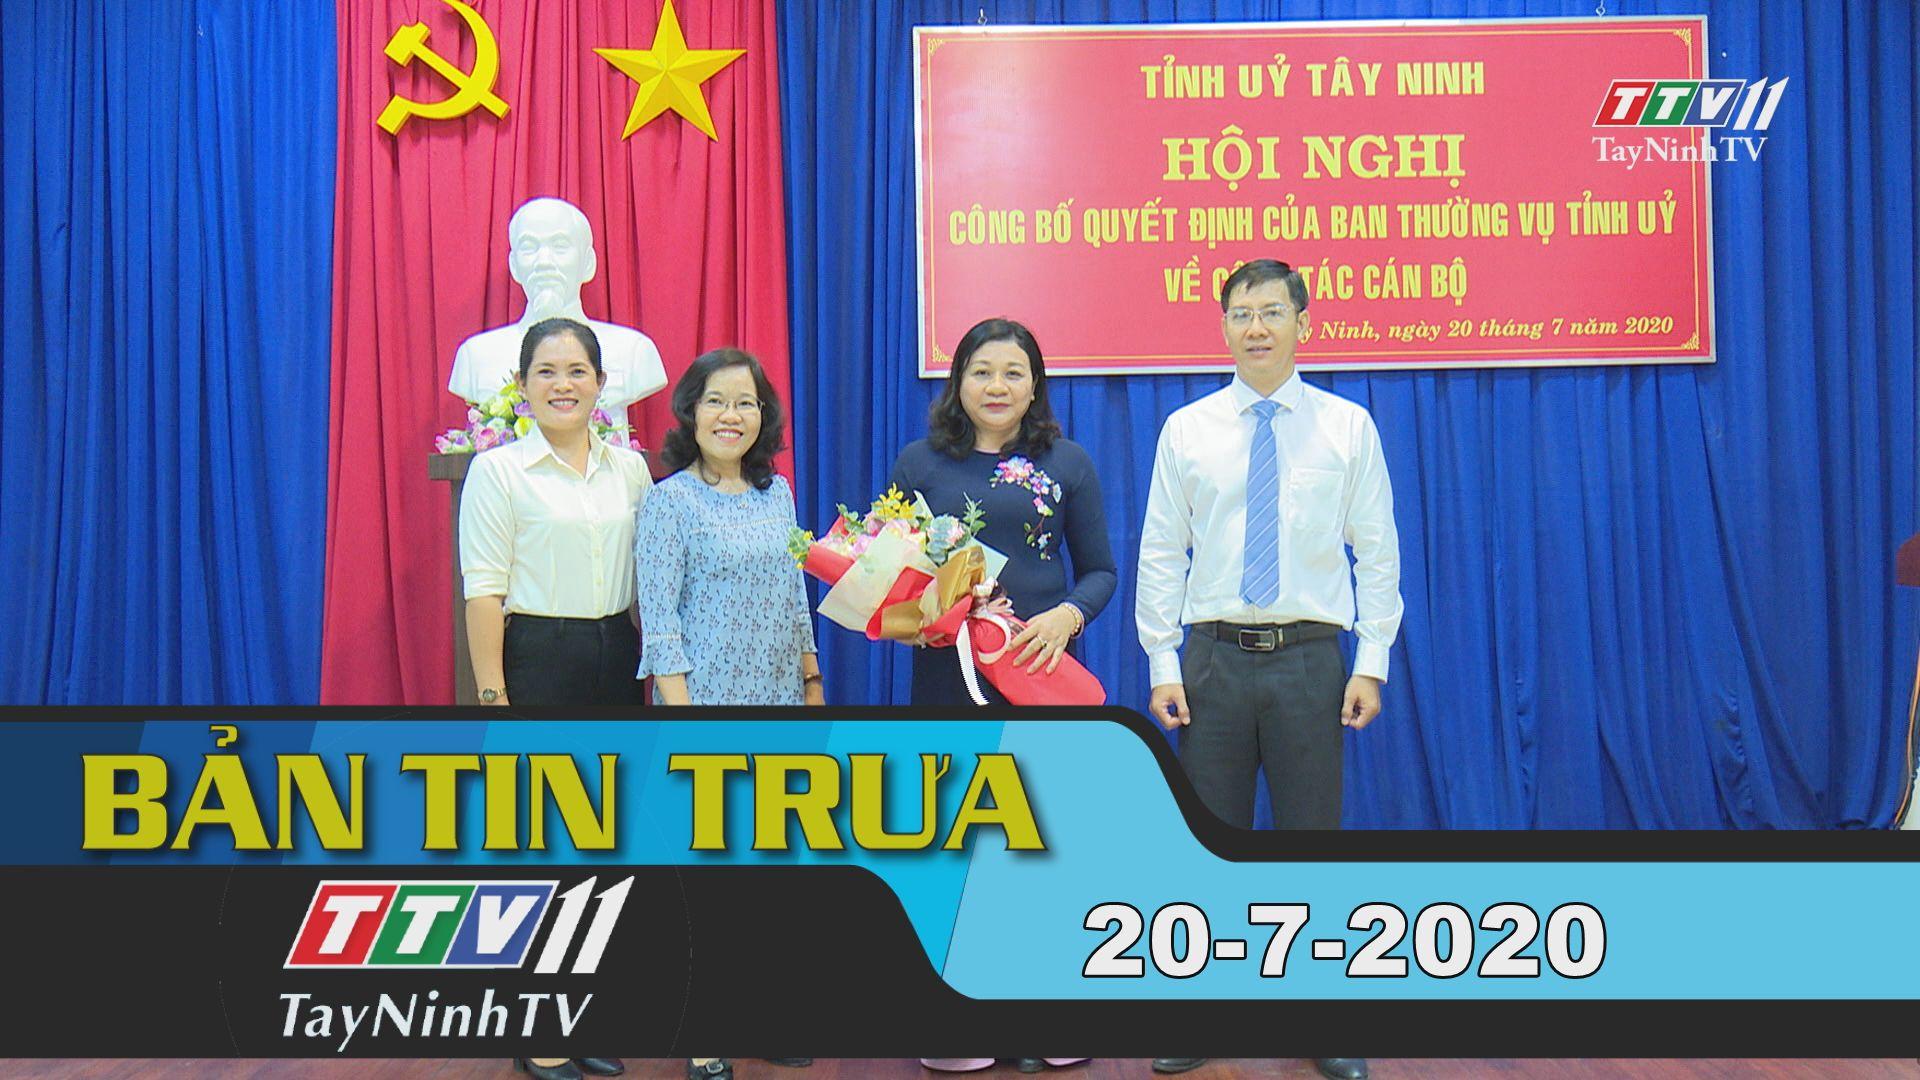 Bản tin trưa 20-7-2020 | Tin tức hôm nay | TayNinhTV